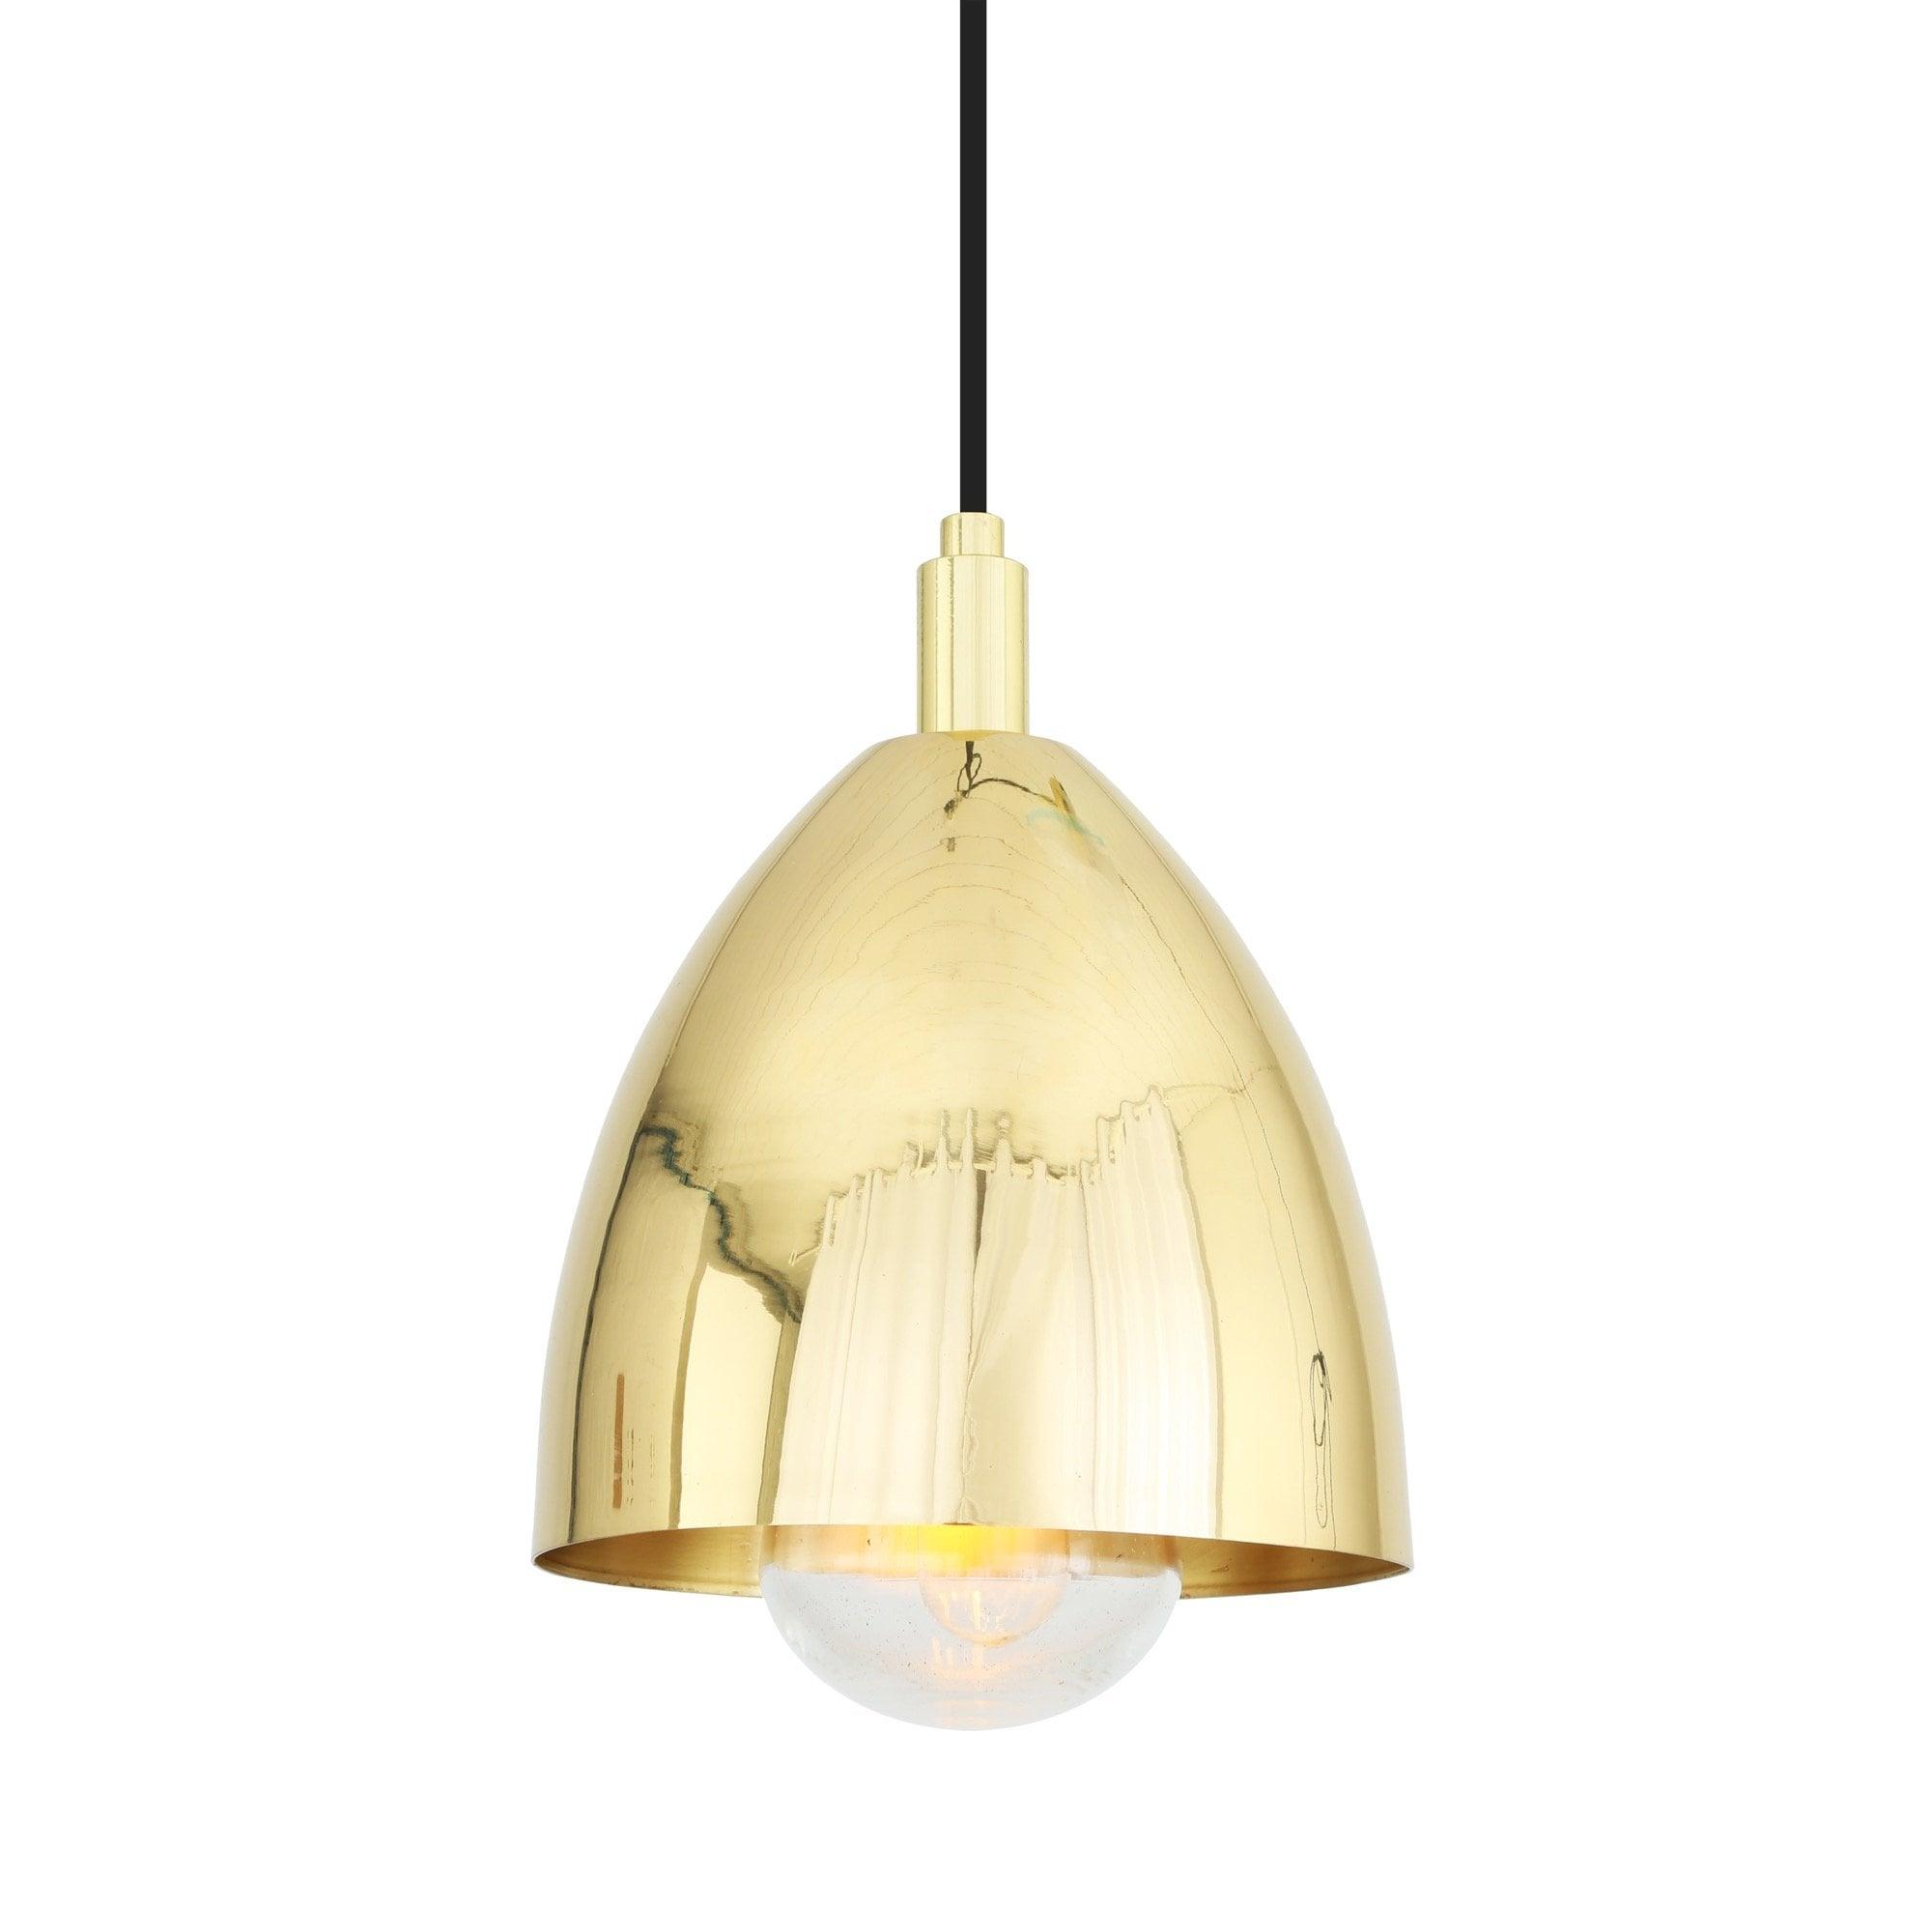 Jorah Polished Brass Bathroom Ceiling Pendant Designer Lighting Uk